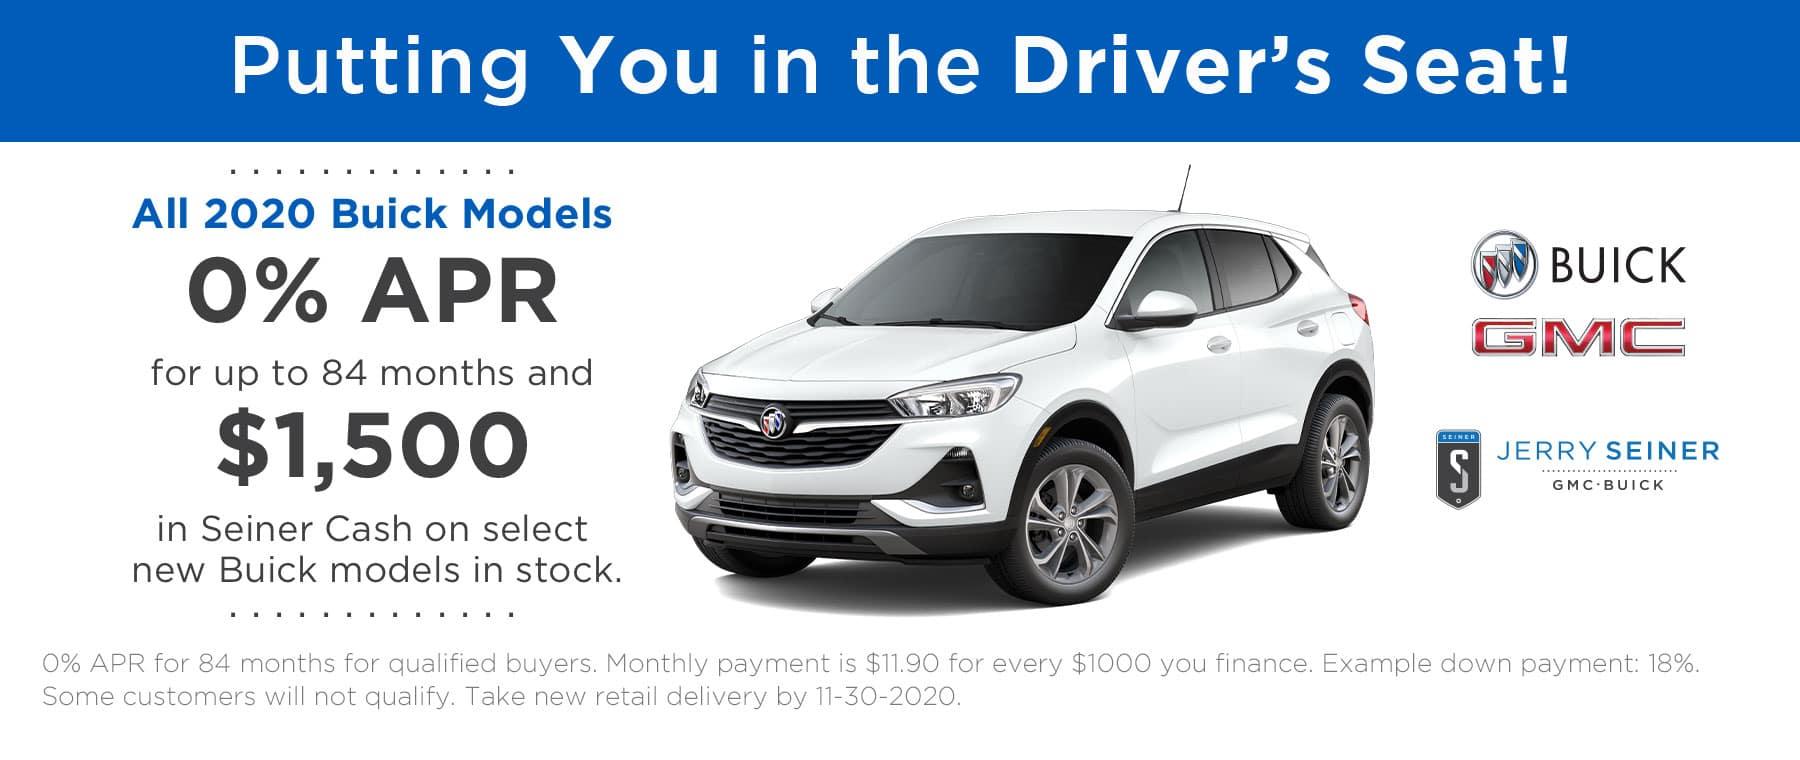 JER20-0005_November_Campaign_Digital-Retailing-Ads_Buick-GMC_Offer-2_Website-Hero_1800x760_v1